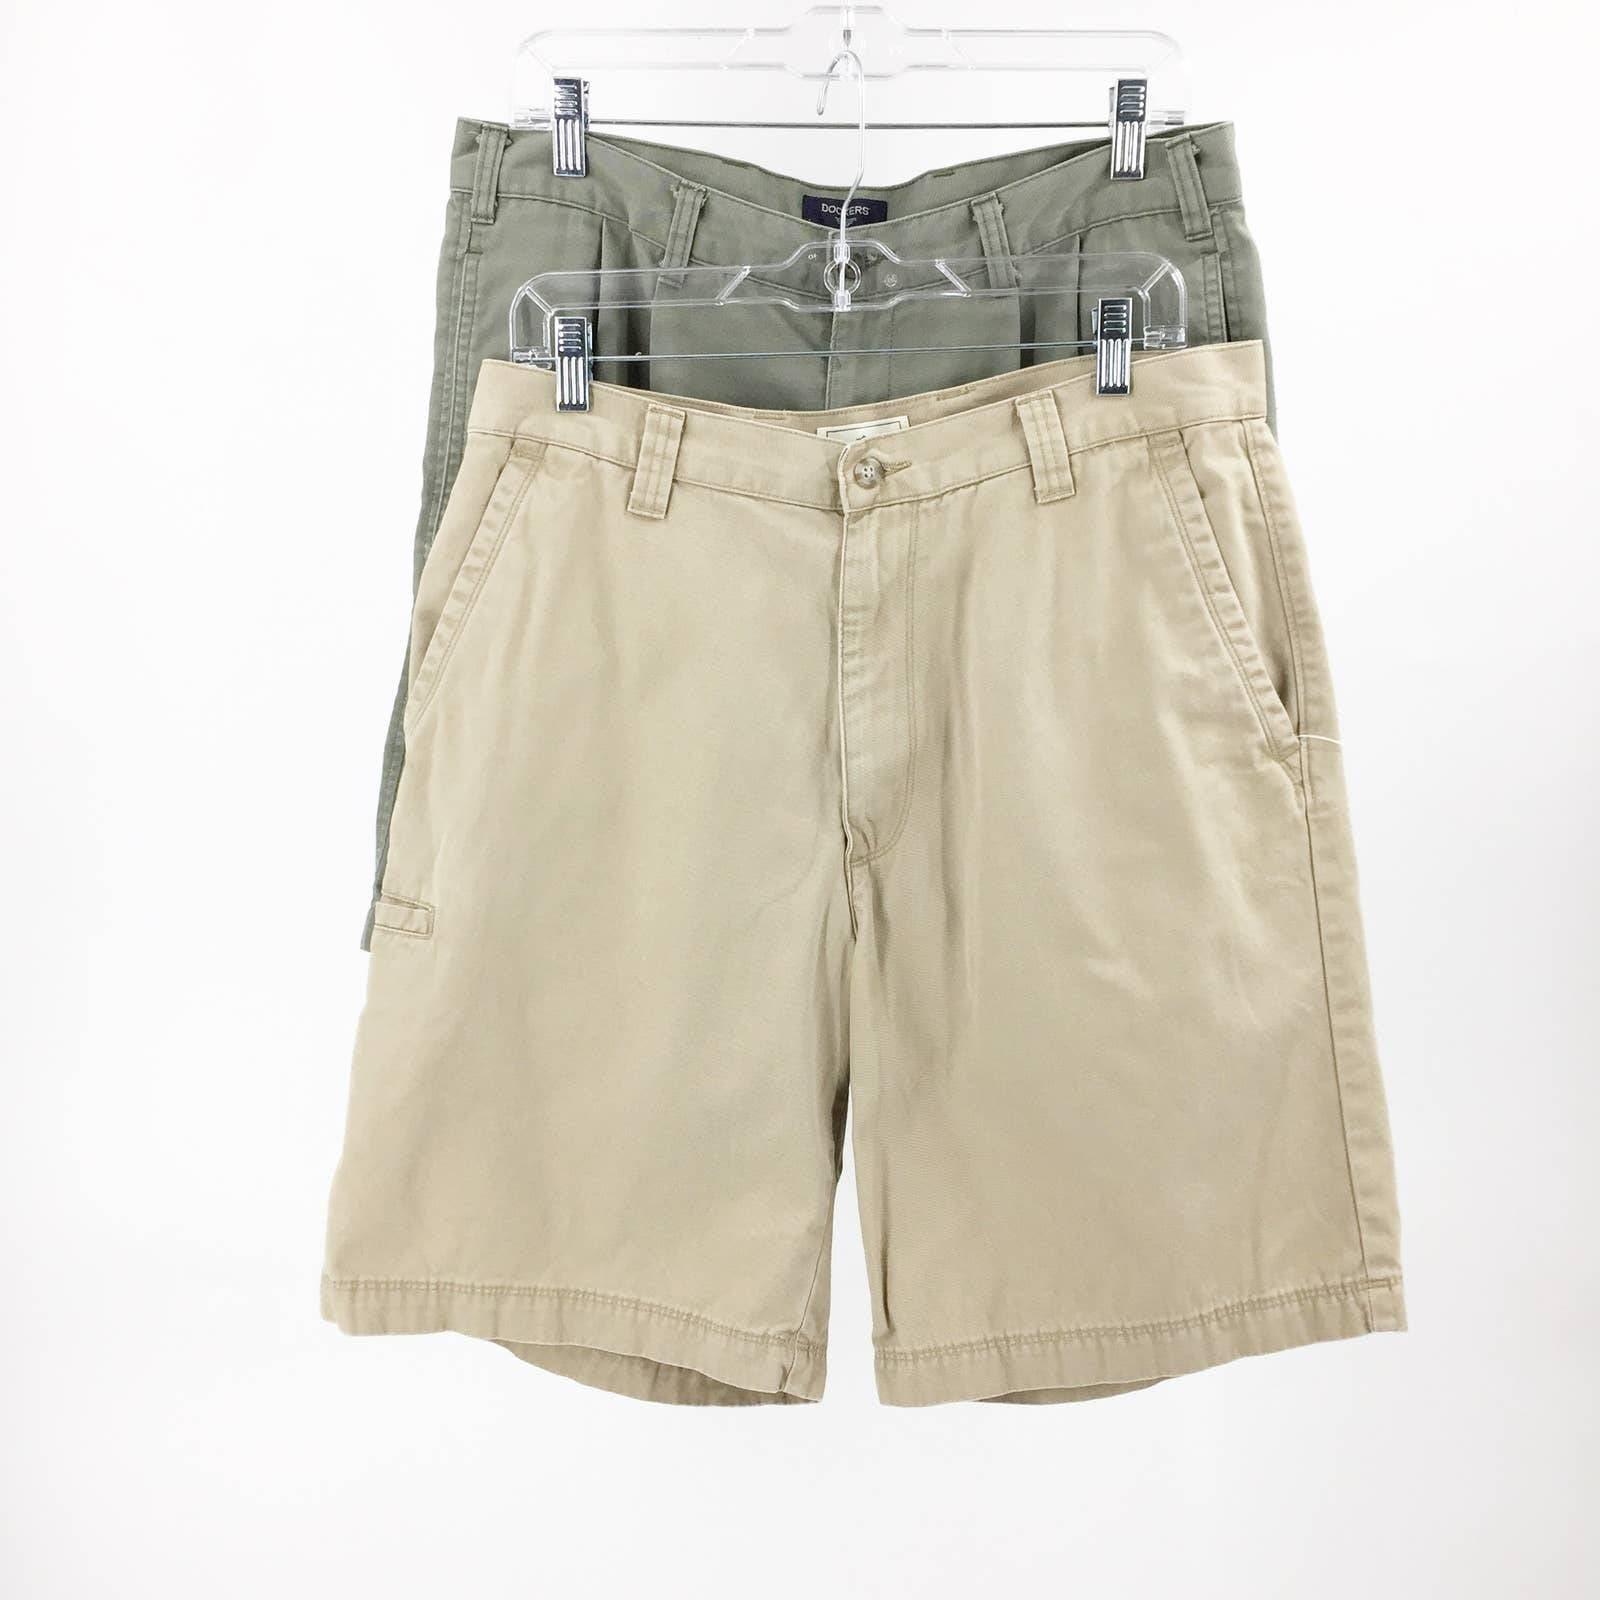 Dockers Shorts Lot of 2 34 064